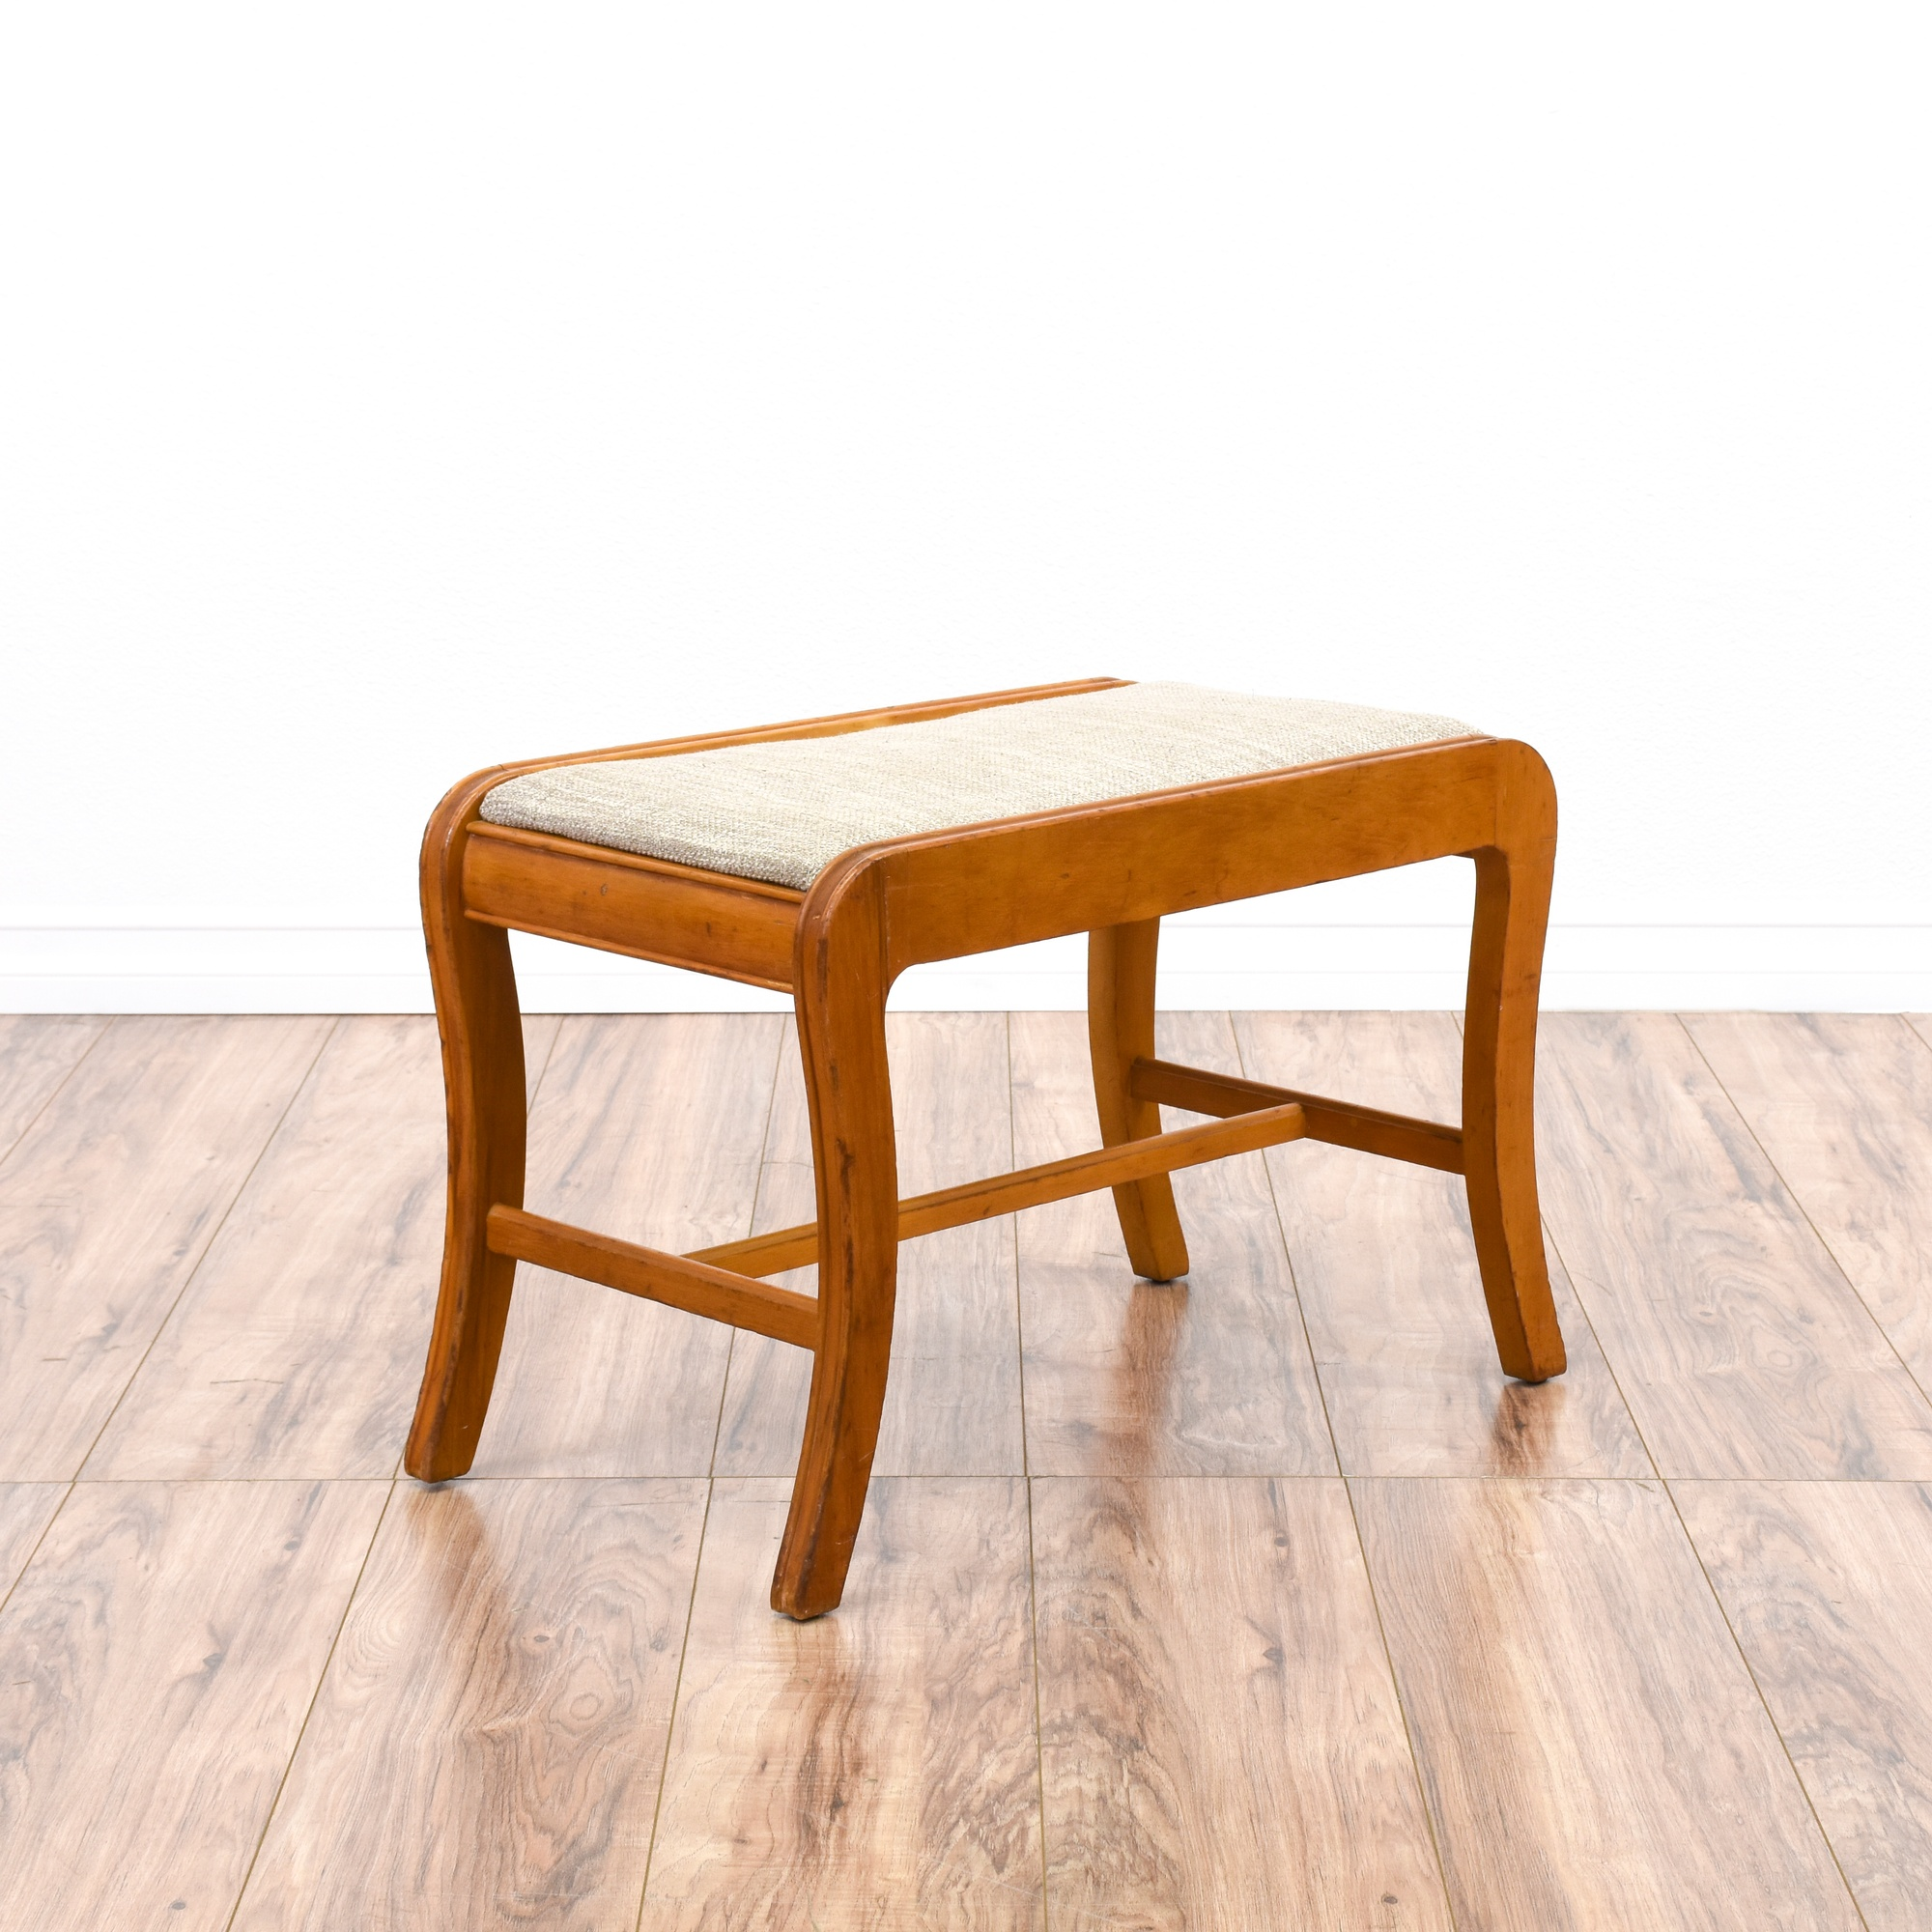 Curved Maple Vanity Stool Bench | Loveseat Vintage Furniture San Diego